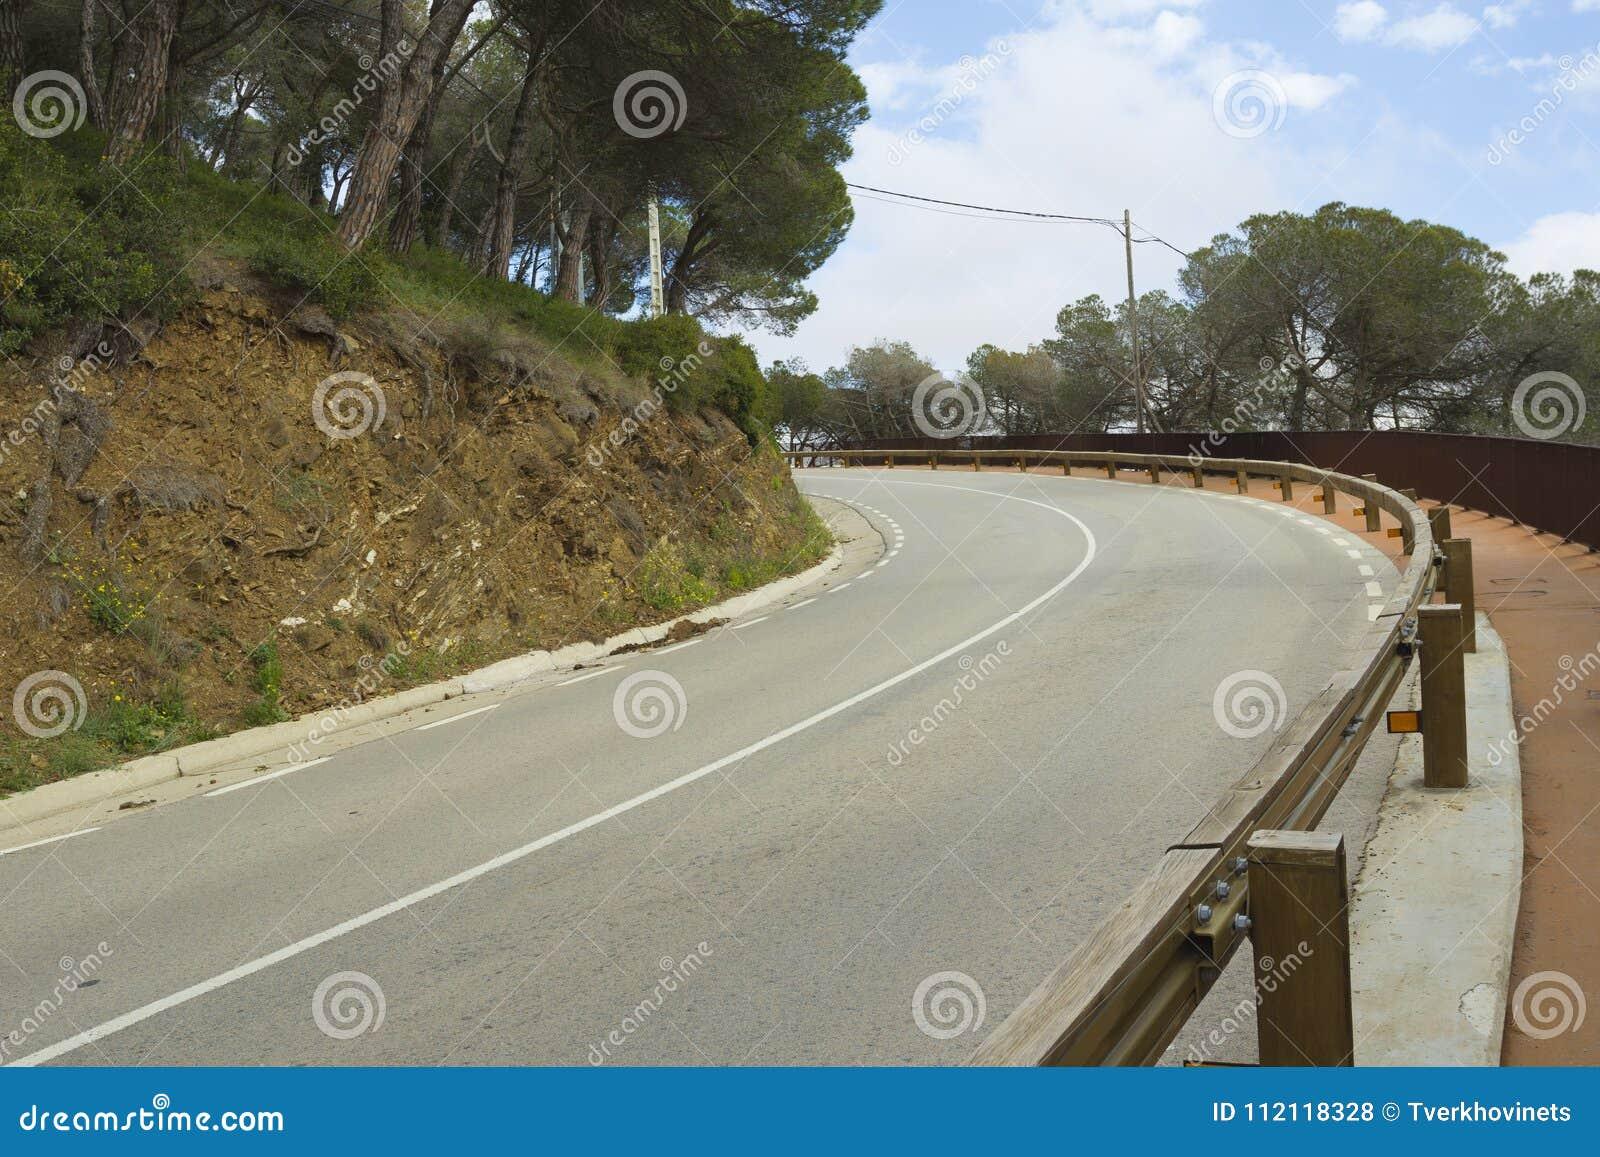 Sección de camino peligrosa